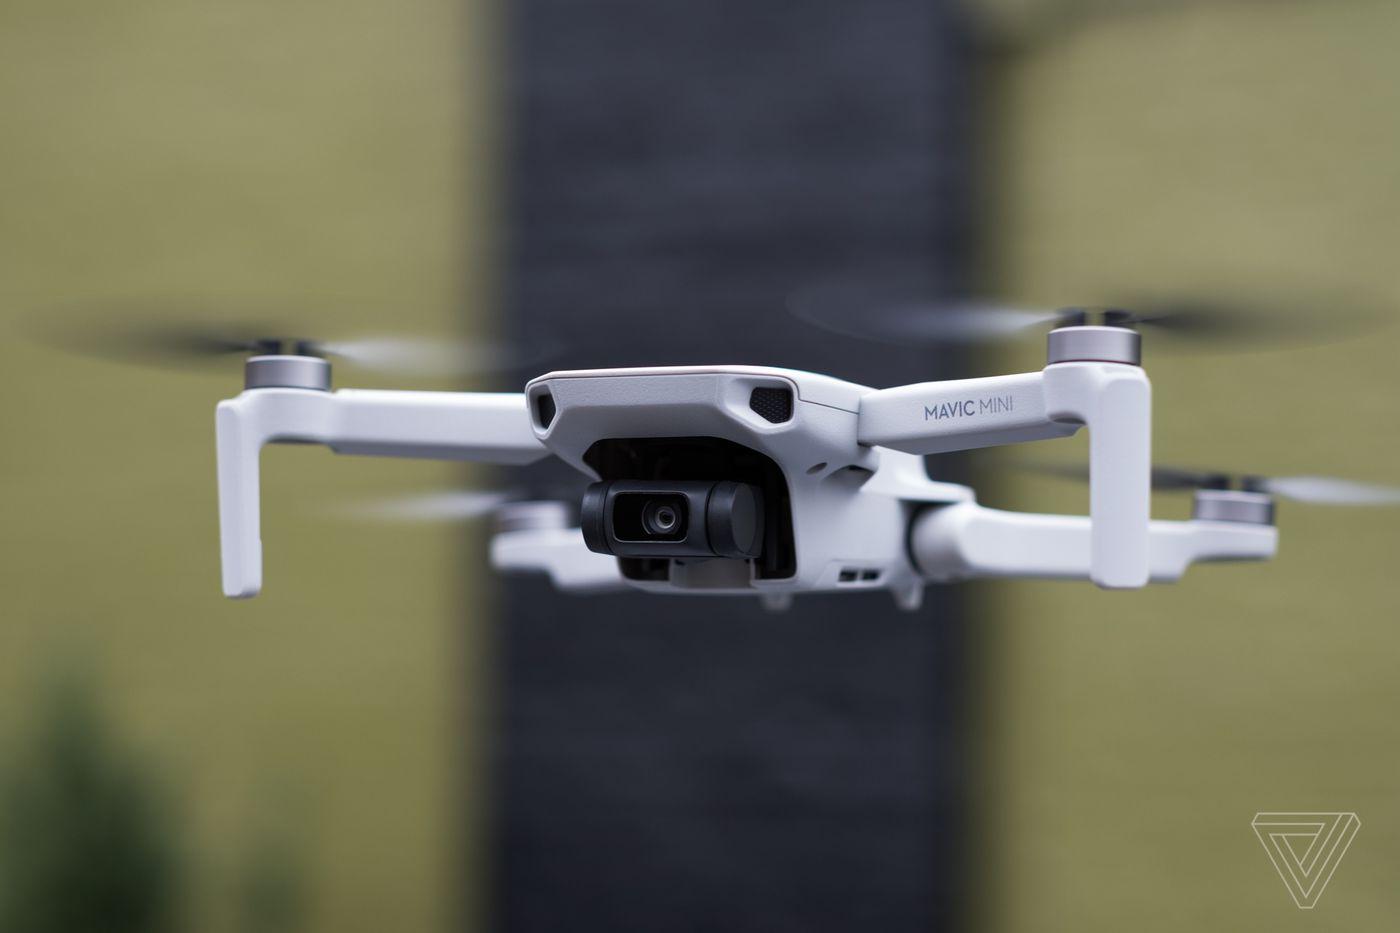 Dji Mavic Mini Announced A 399 Ultra Light Drone That Doesn T Need Faa Registration The Verge